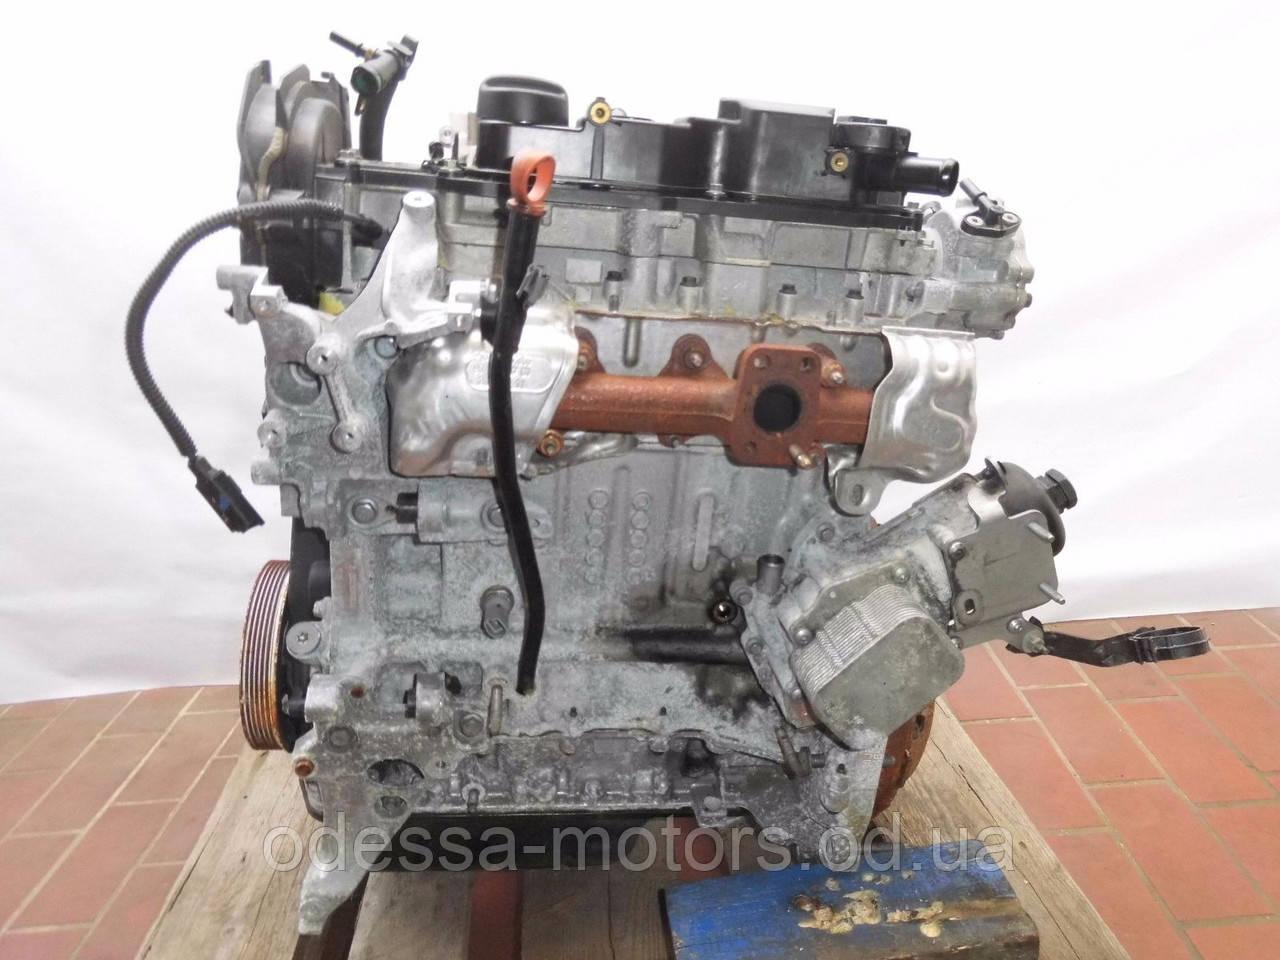 Двигатель Peugeot 2008 1.6 HDi, 2013-today тип мотора 9HP (DV6DTED), фото 1